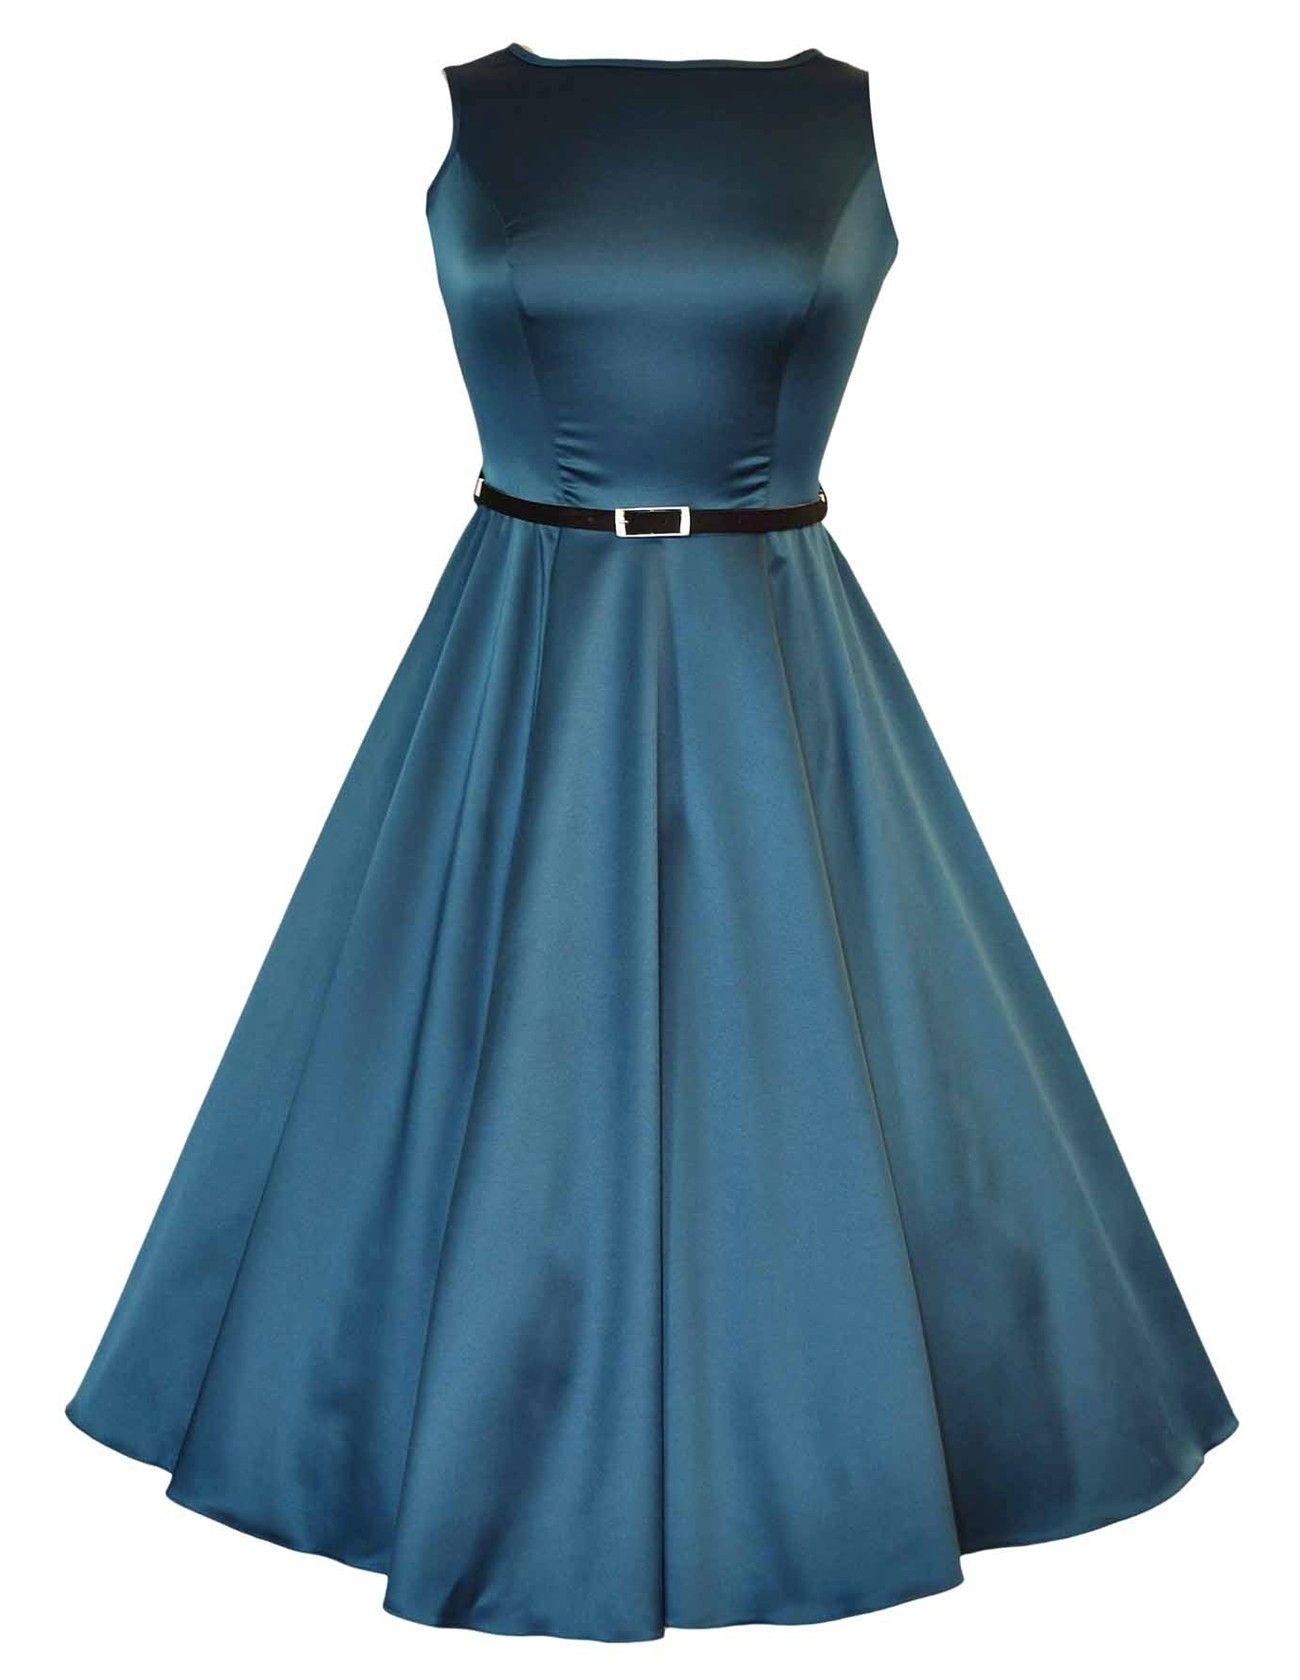 Lady V London The Teal Green Hepburn Dress - sizes UK 16 to 28 ...